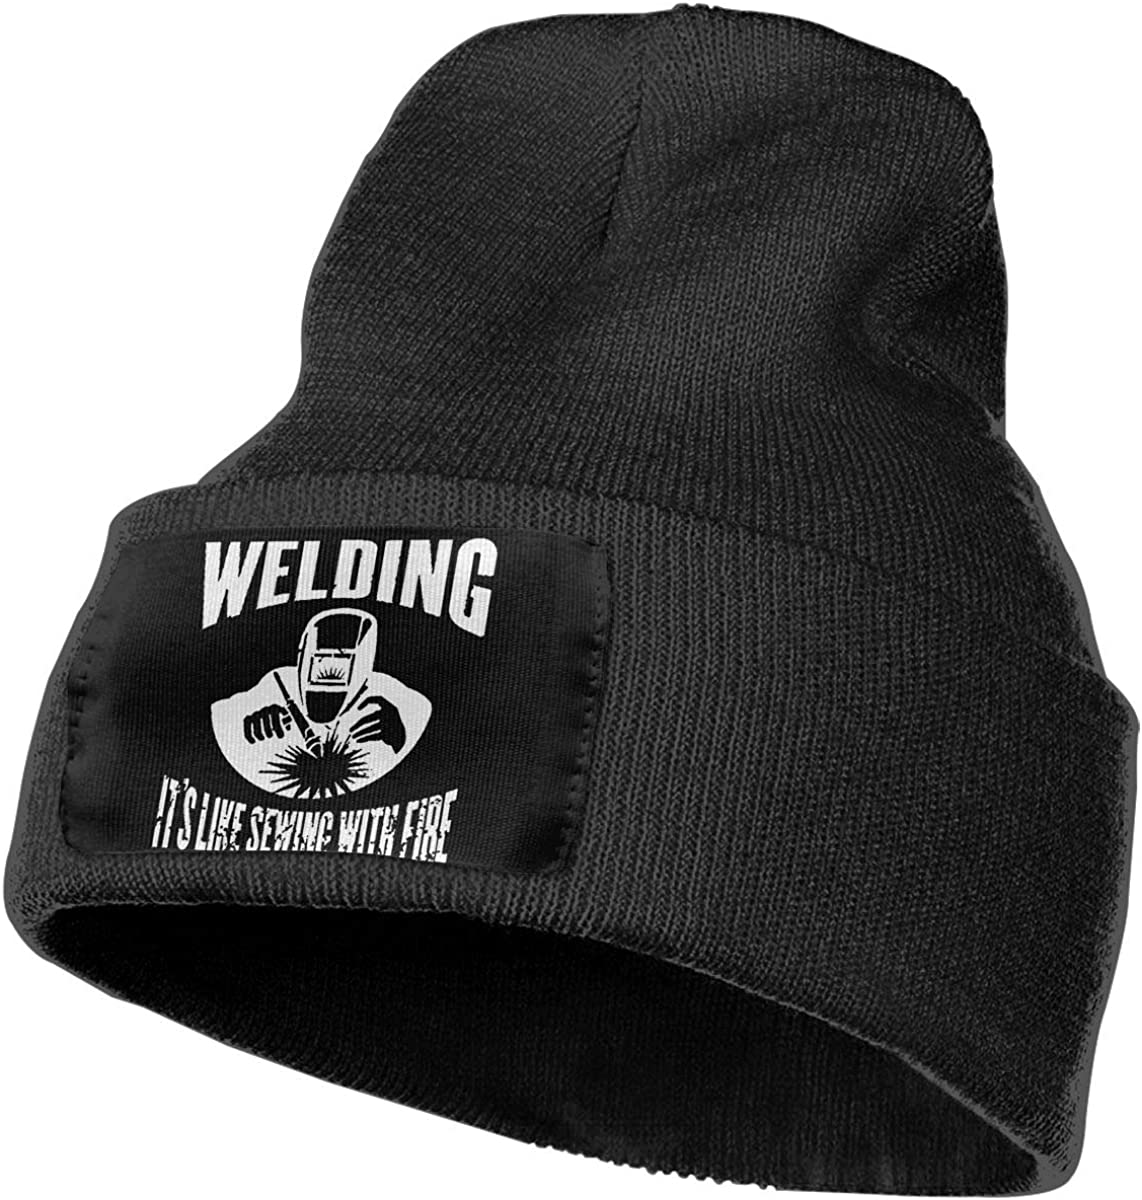 Classic Welding Its Like Sewing with Fire Warm Winter Hat Knit Beanie Skull Cap Cuff Beanie Hat Winter Hats for Men /& Women